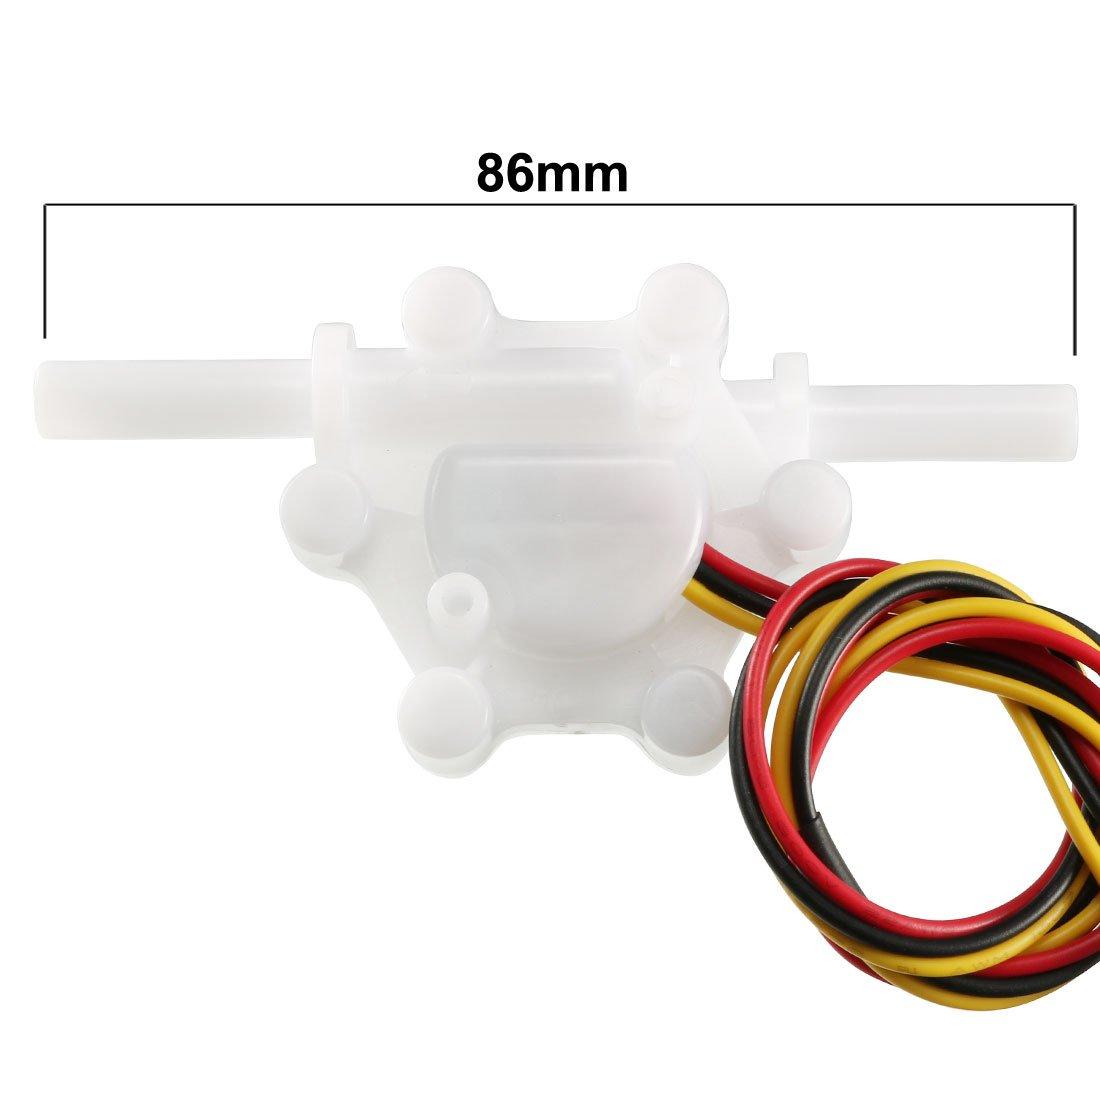 sourcing map Halleffekt Wasser Schalter Durchflussmesser DC5V 0.15-1.5L// min SEN-HZ06K DE de